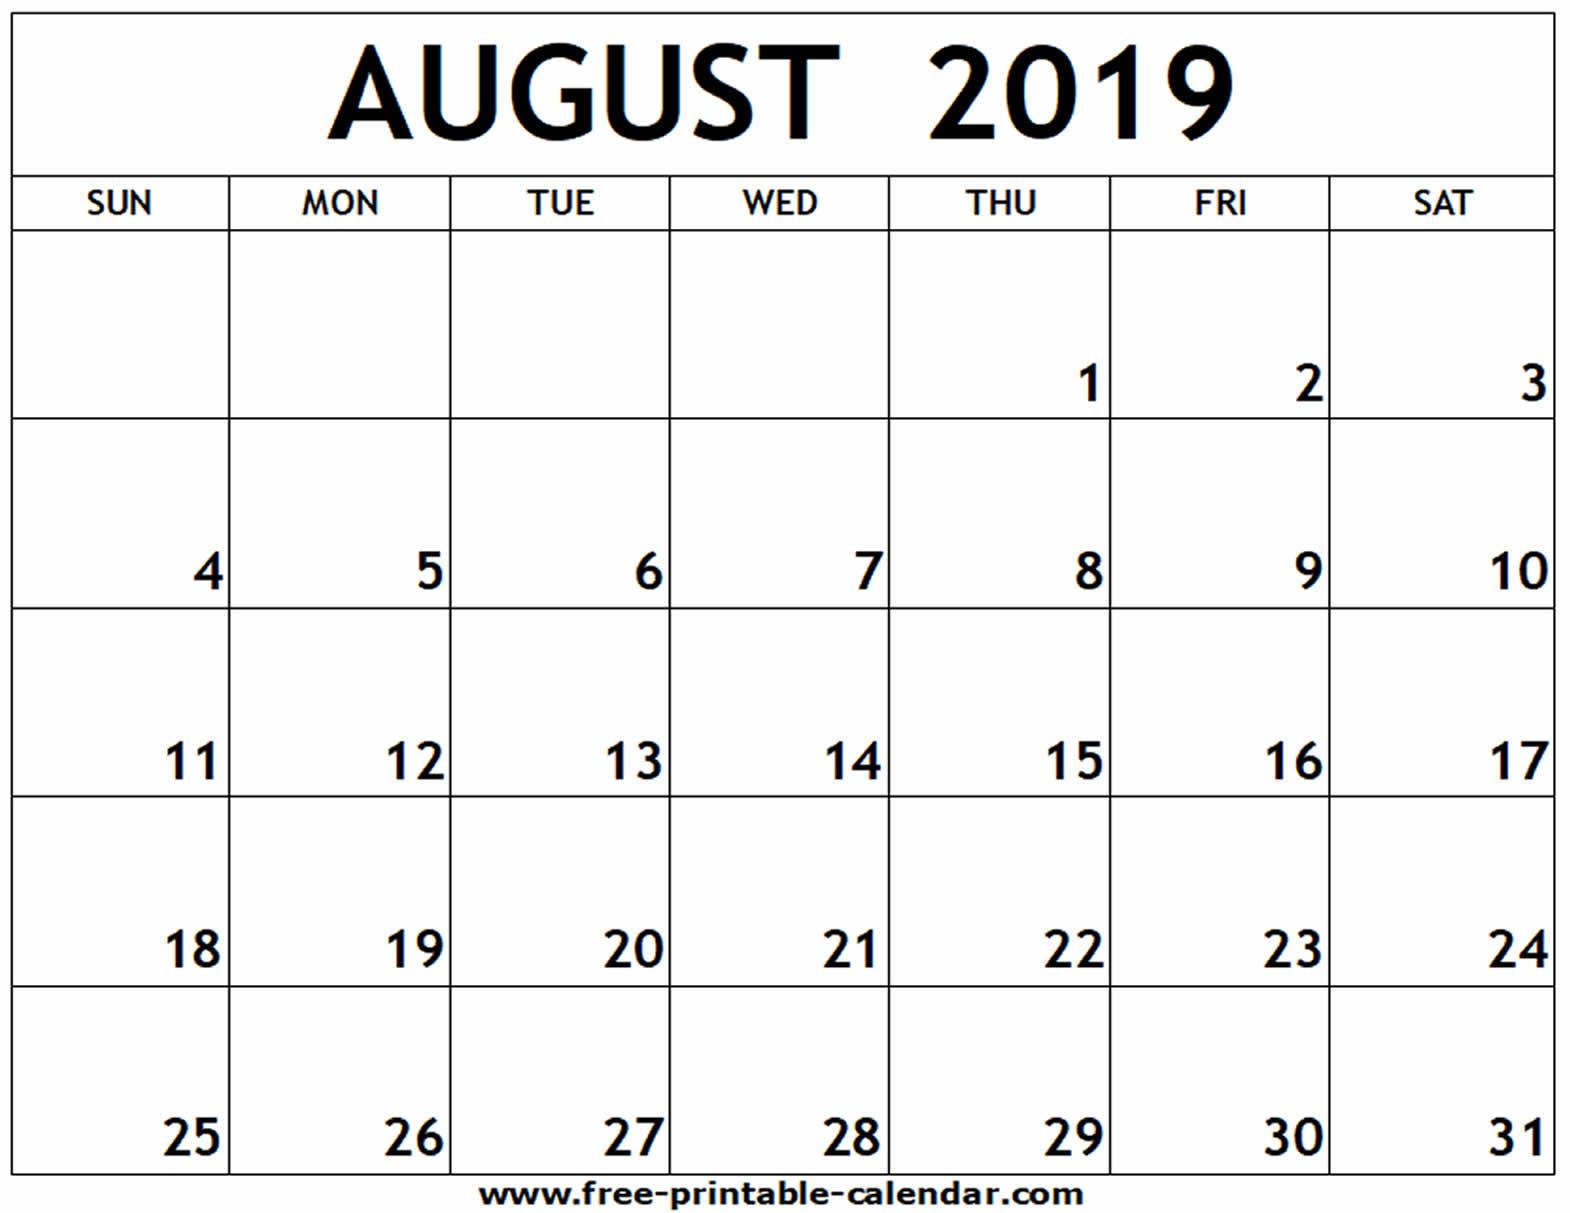 August 2019 Printable Calendar - Free-Printable-Calendar within Printable Blank Aug Calendar